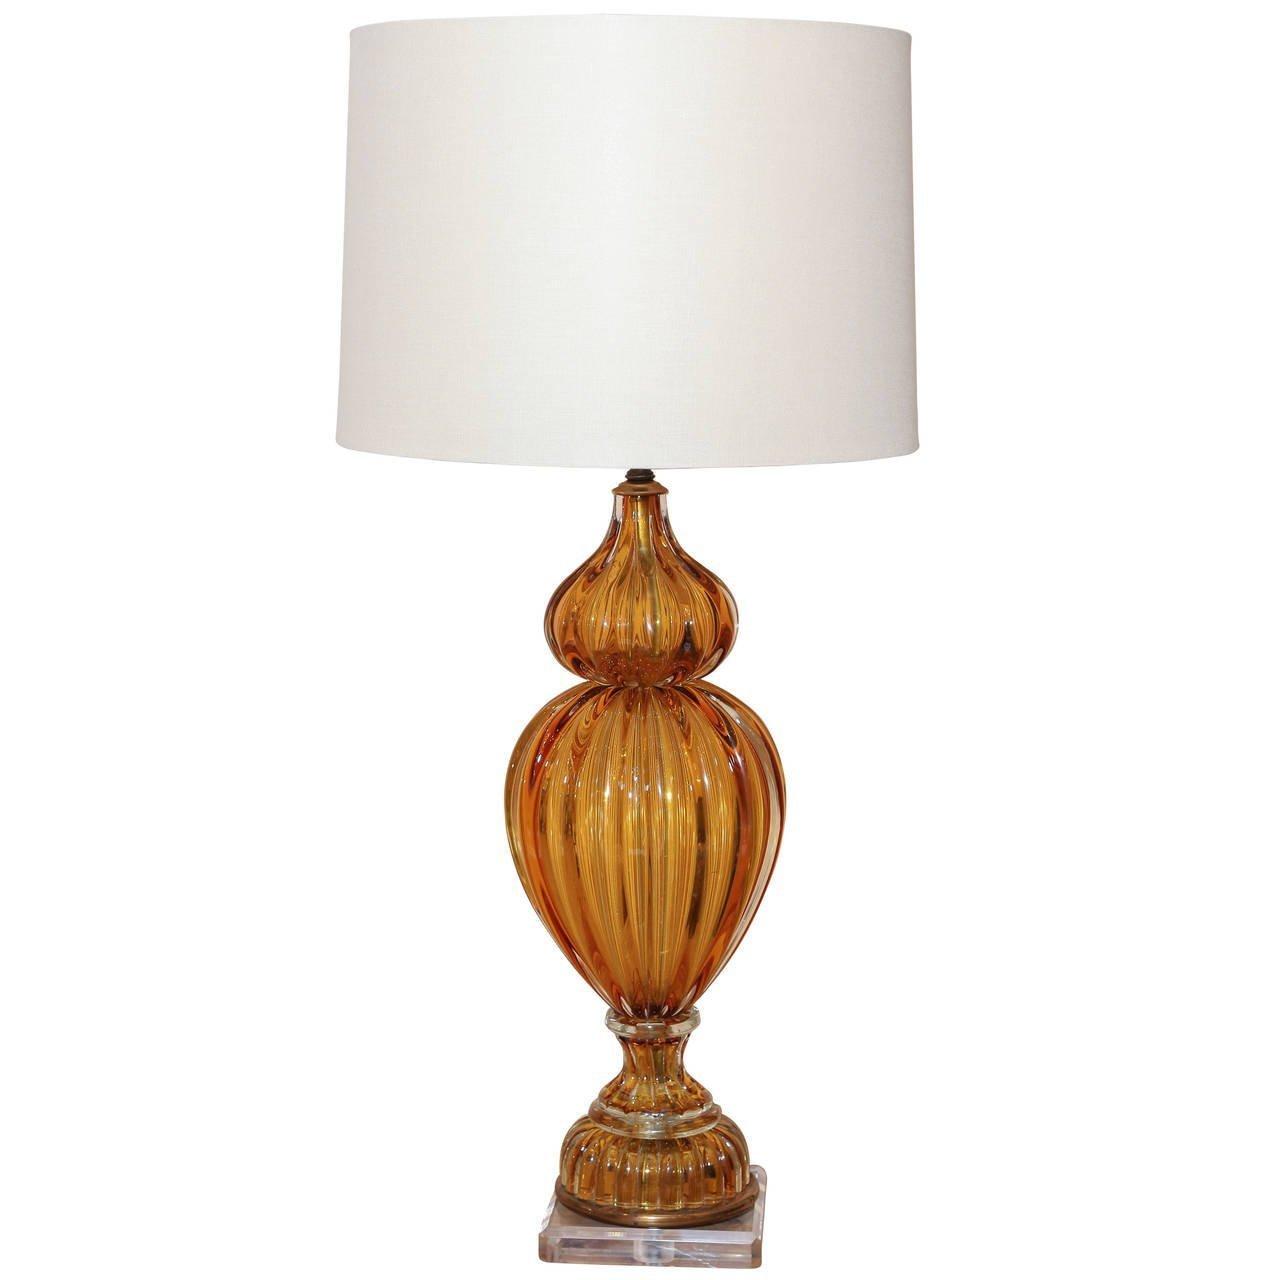 murano glass lamp skelton culver